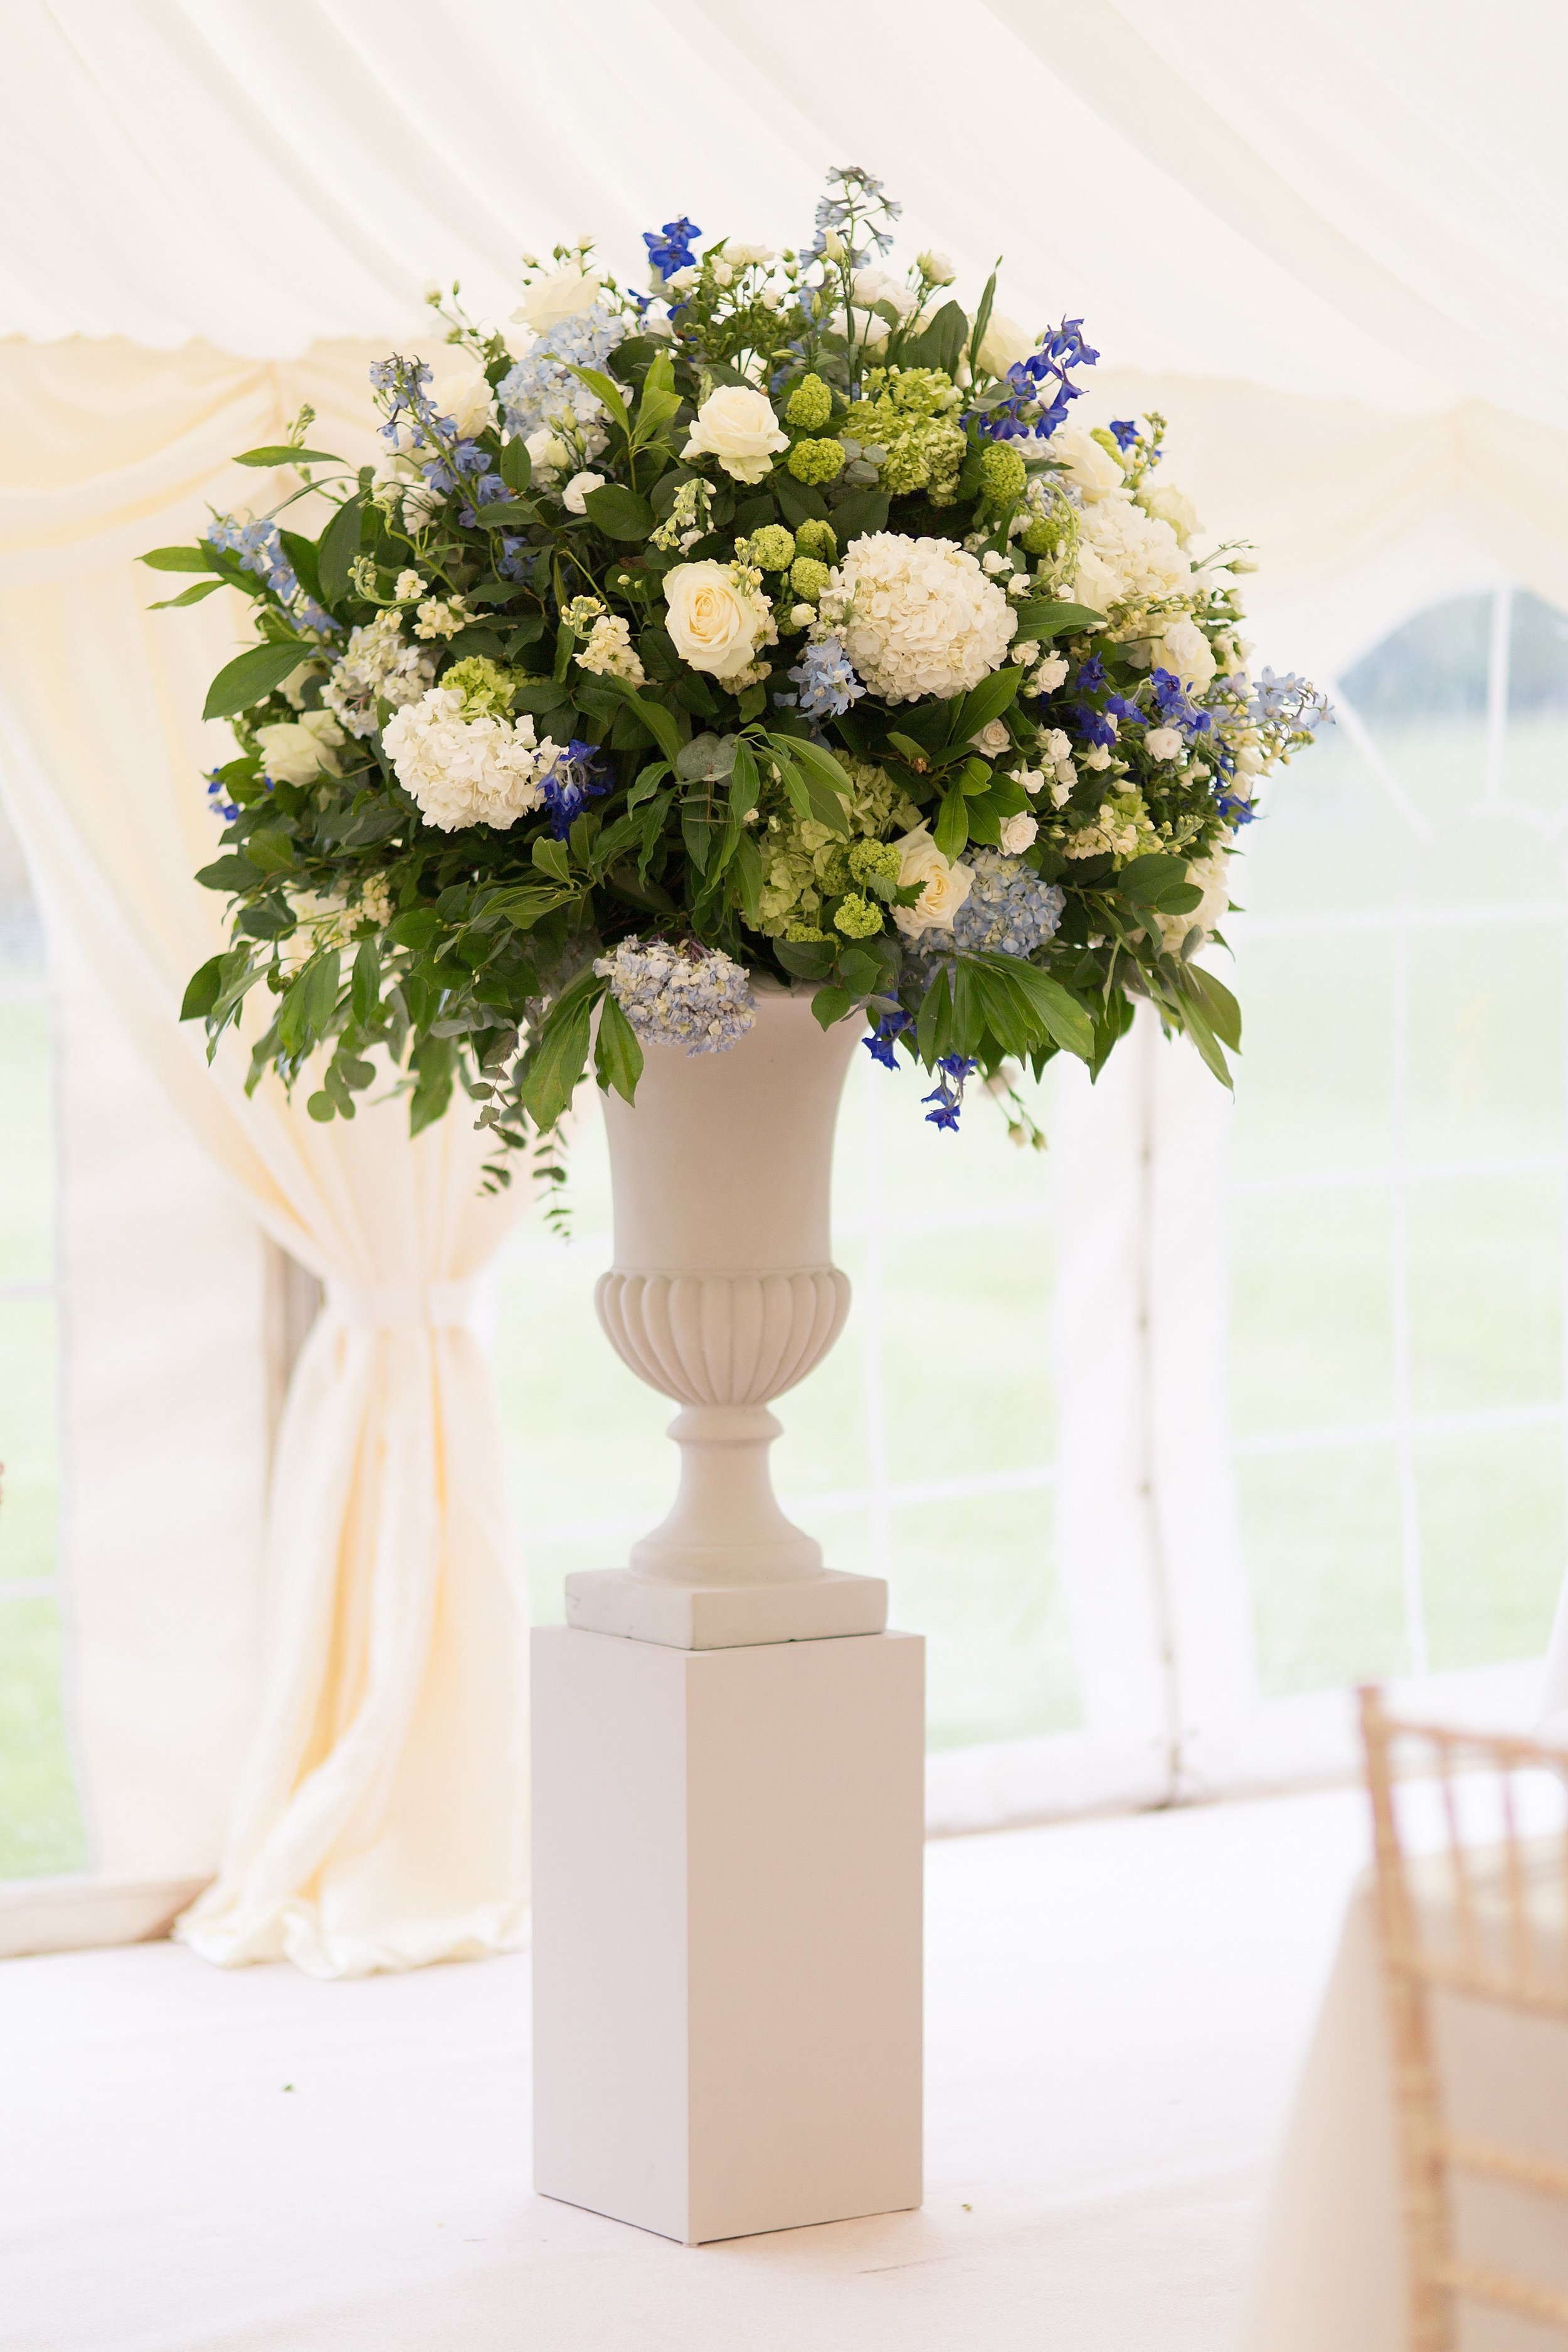 RECEPTION_MARQUEE_URN_MIRIAM_FAITH_WEDDING_FLOWERS.jpg